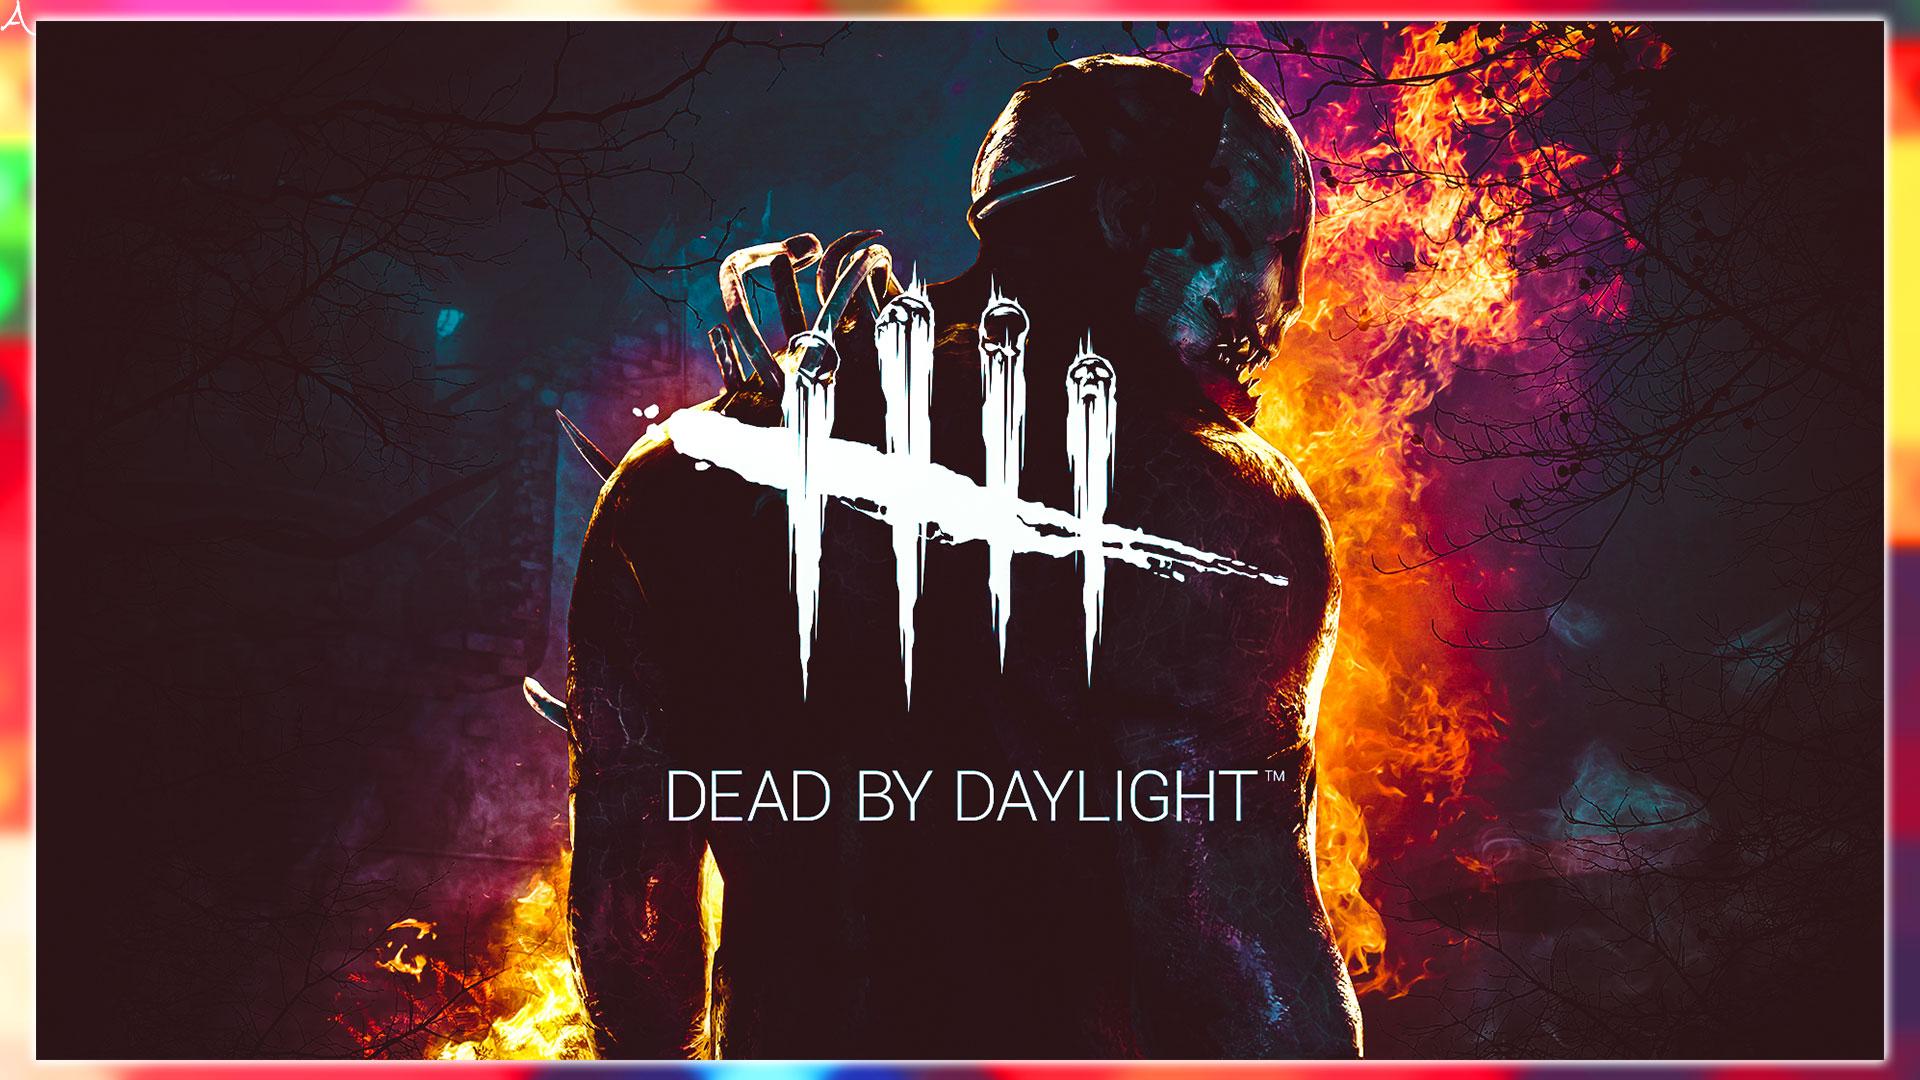 PC版「Dead by Daylight」に必要な最低/推奨スペックを確認:快適プレイに必要な値段はどれくらい?